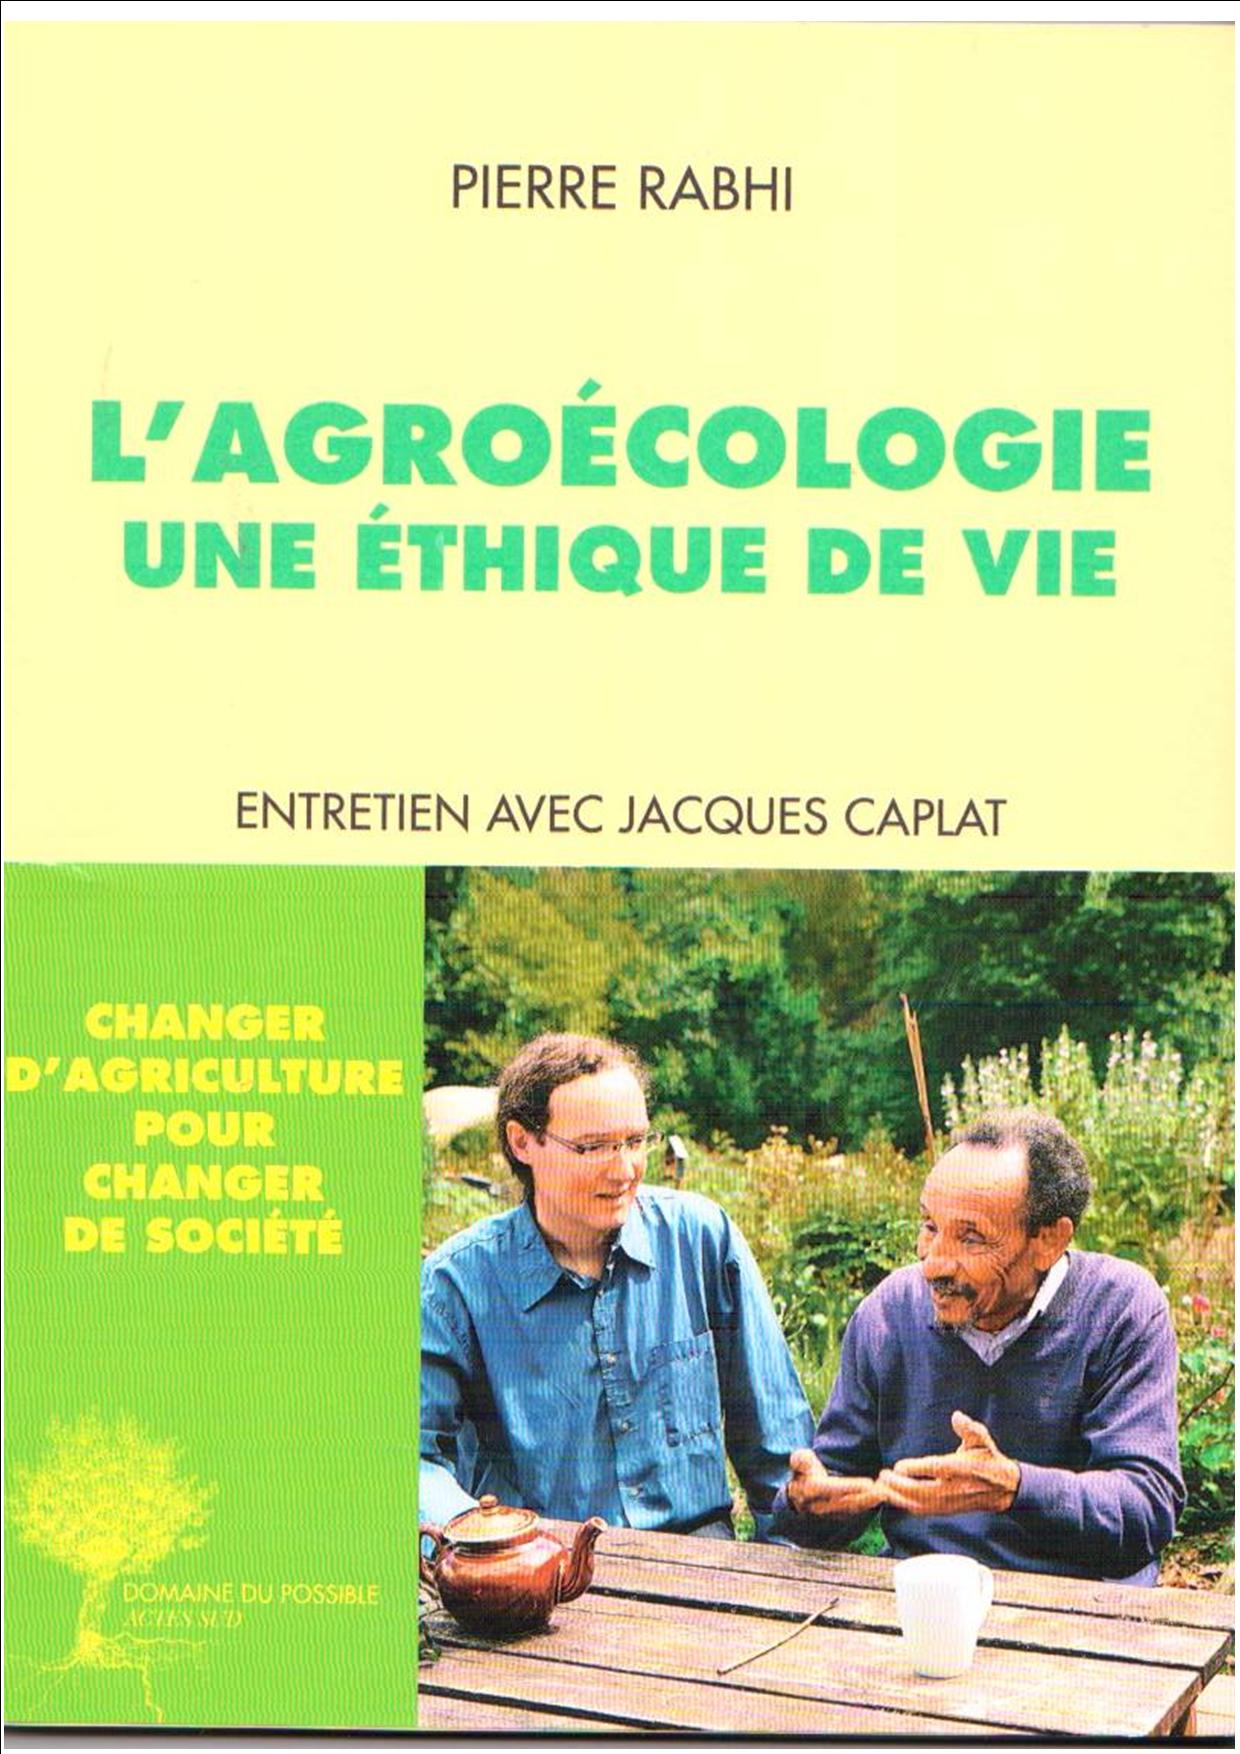 Rabhi agroecologie